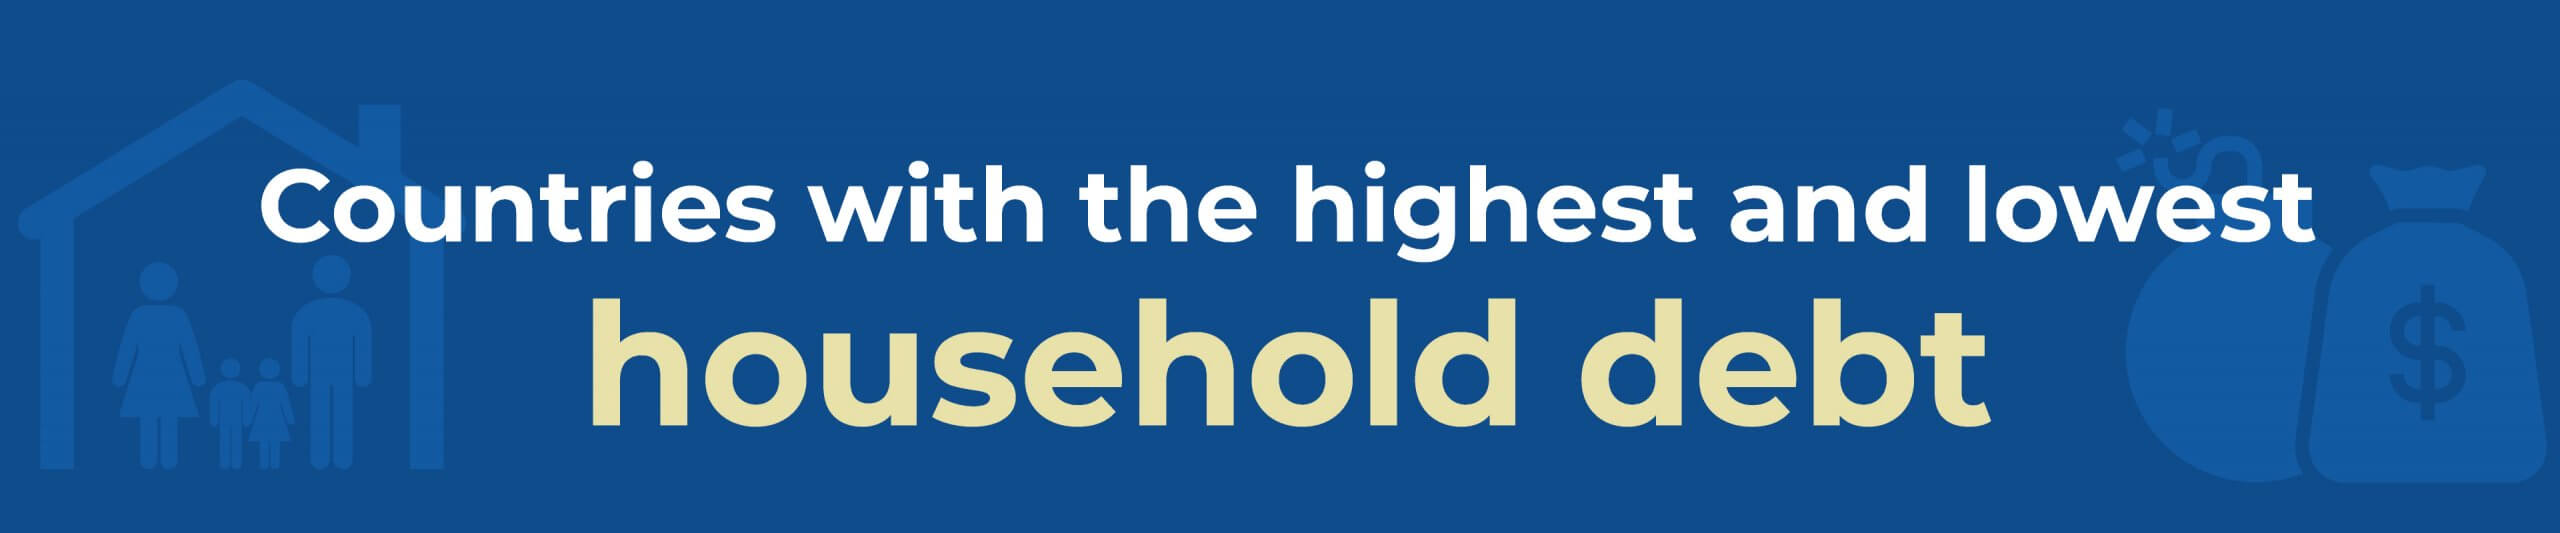 household debt header image